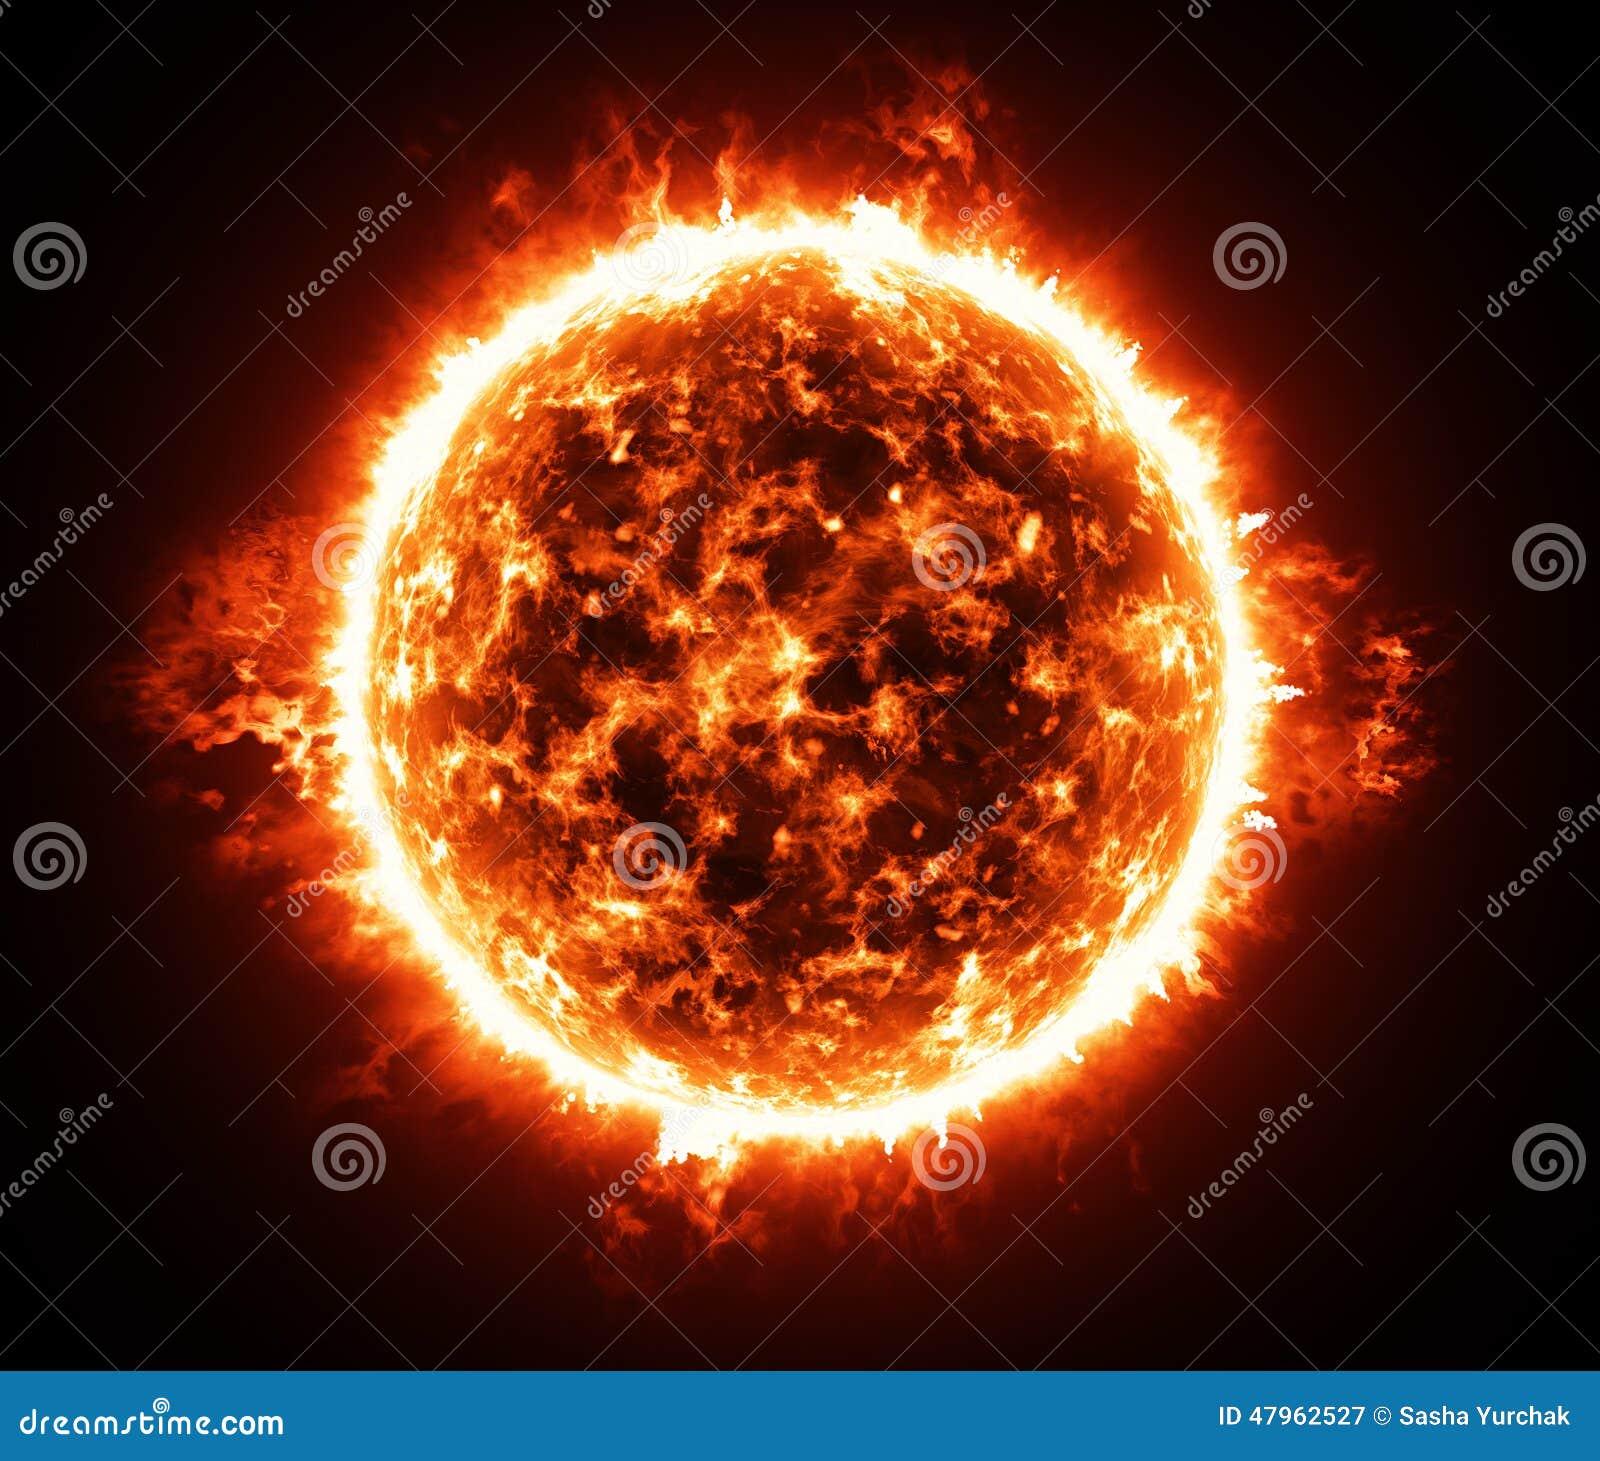 Burning Atmosphere Of Red Giant Star Stock Illustration ...